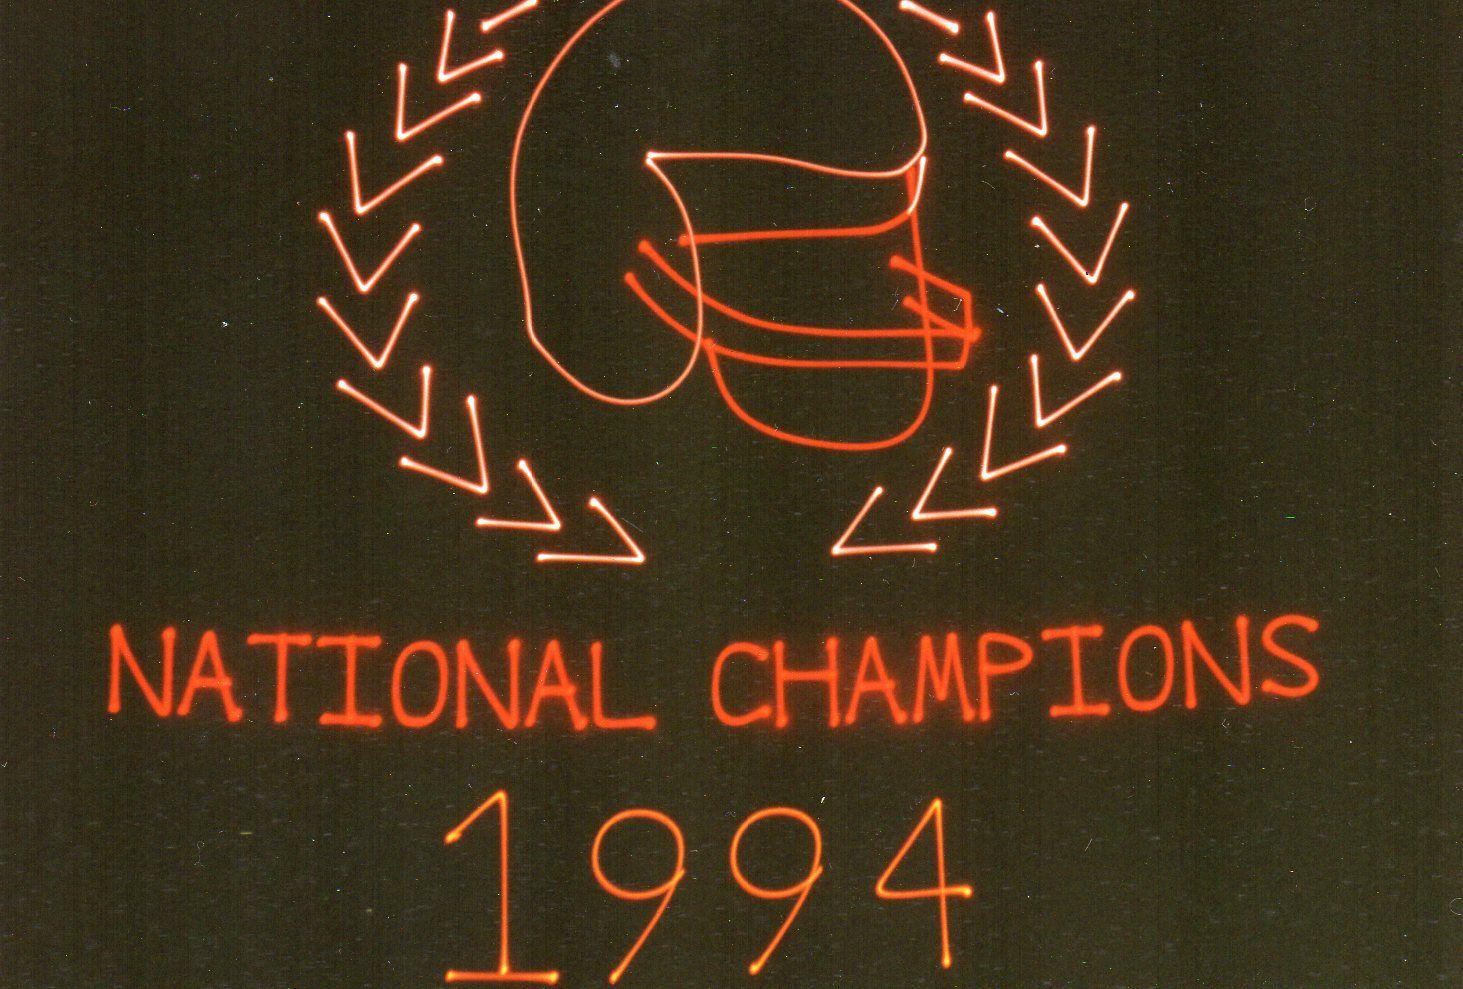 Mueller Planetarium created a laser show celebrating the Husker football team at Memorial Stadium (1995)